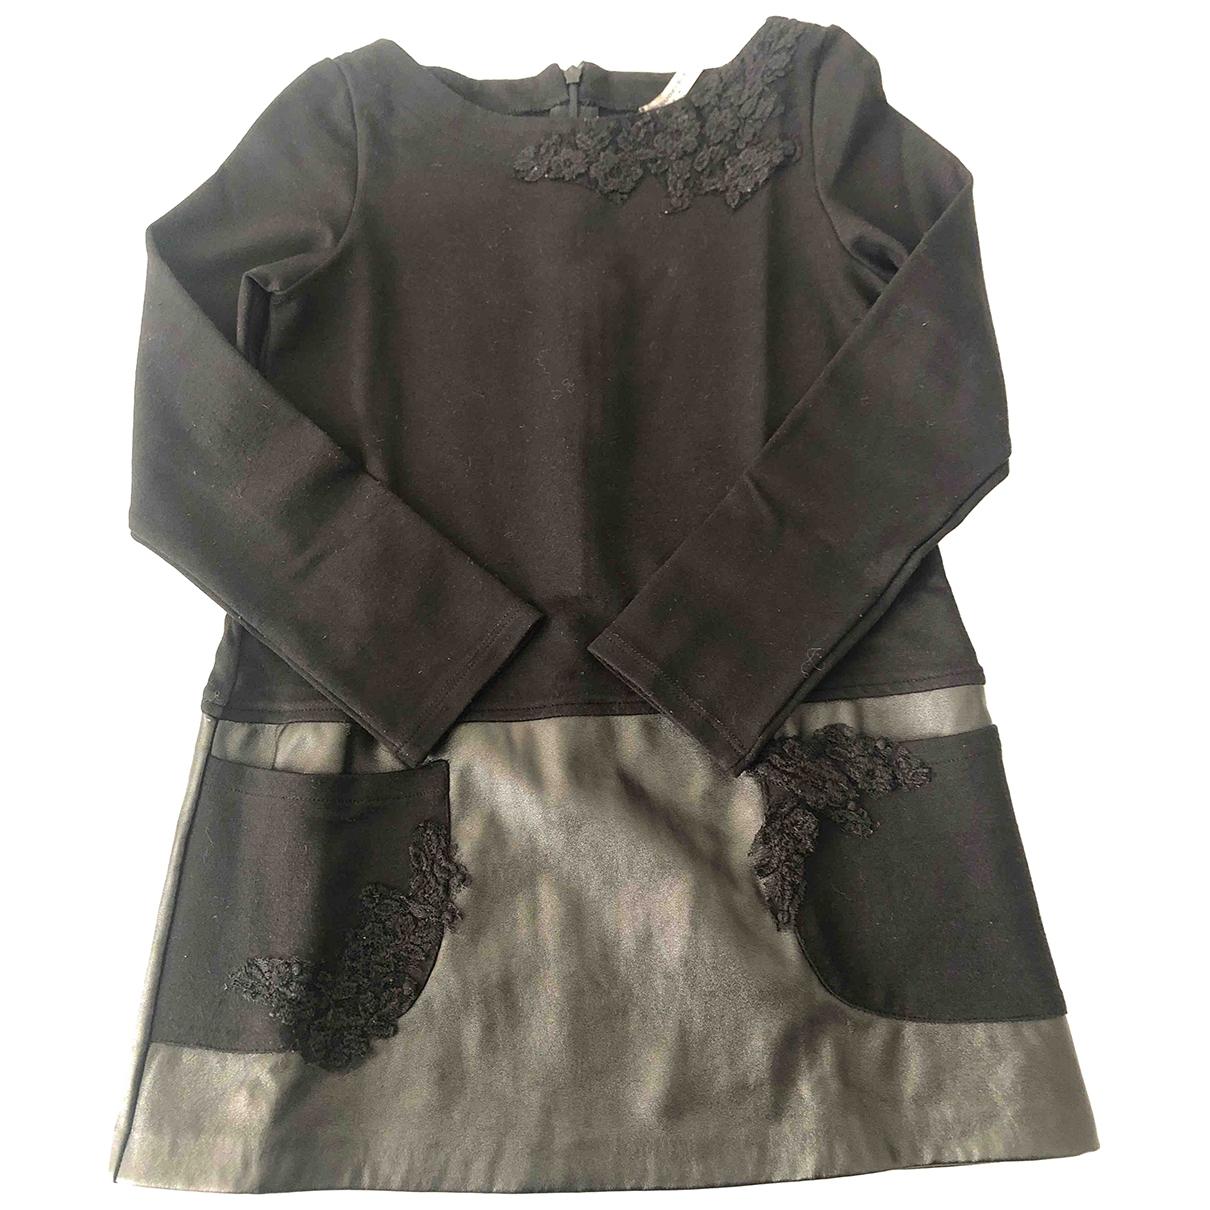 Ermanno Scervino \N Black dress for Kids 6 years - up to 114cm FR